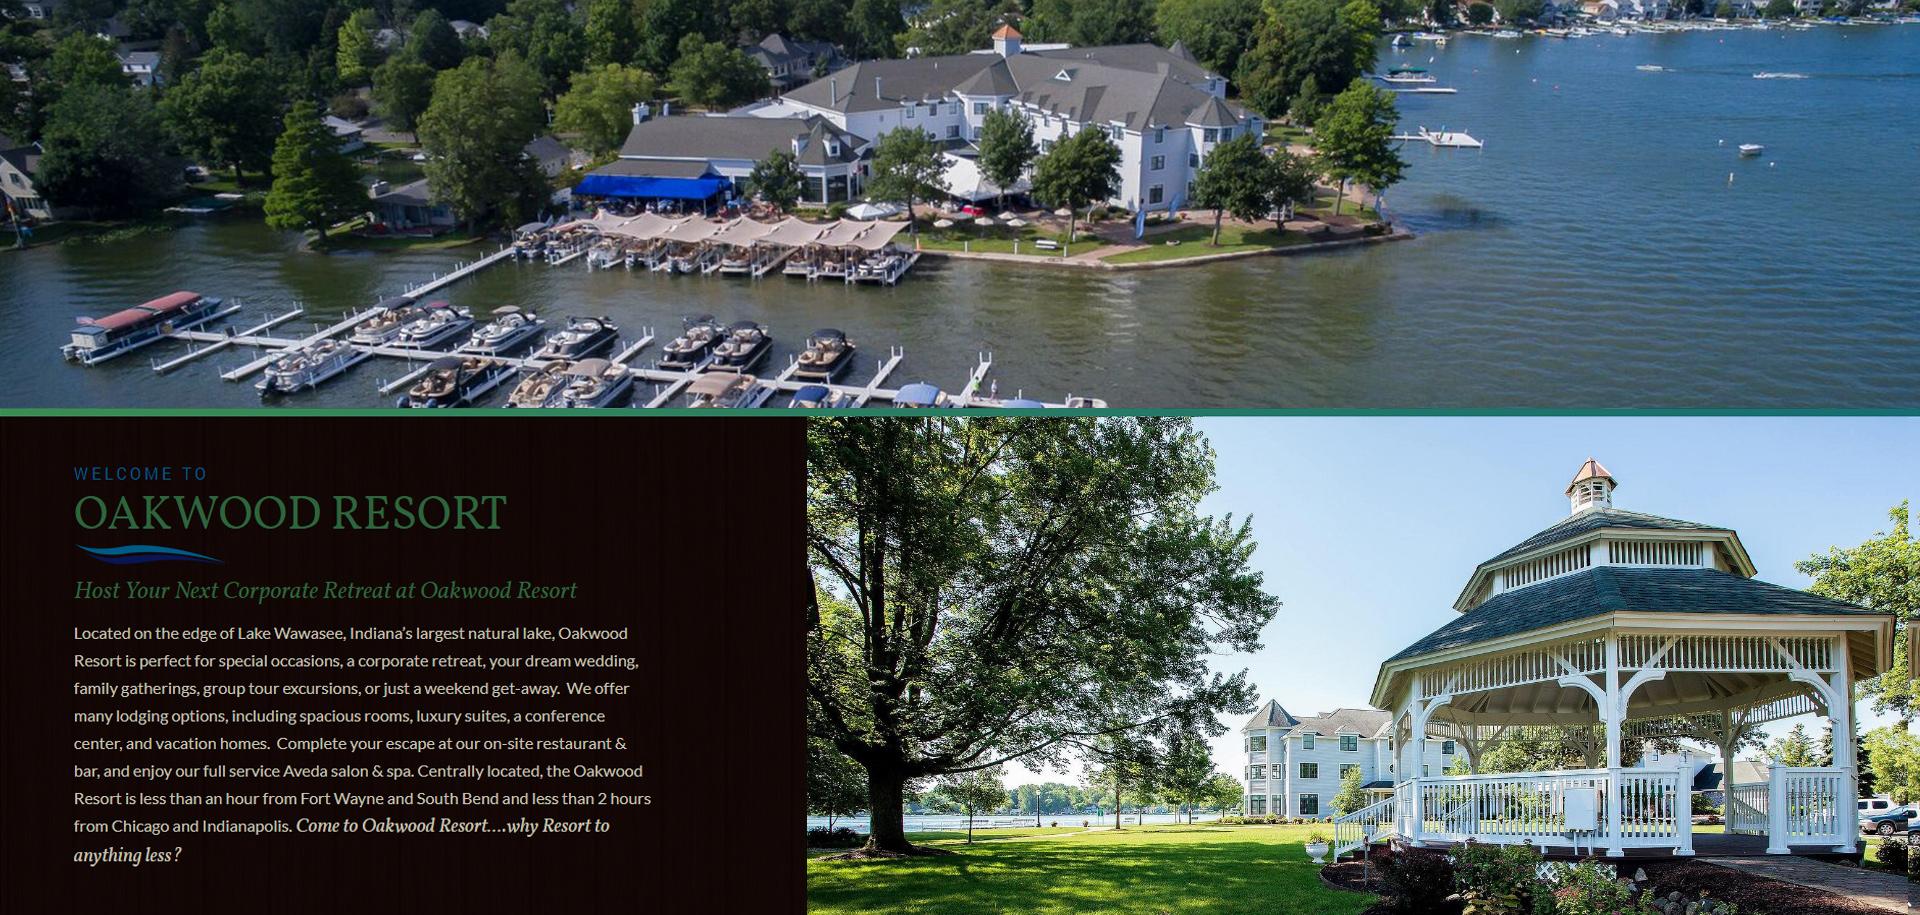 oakwood-resort-1